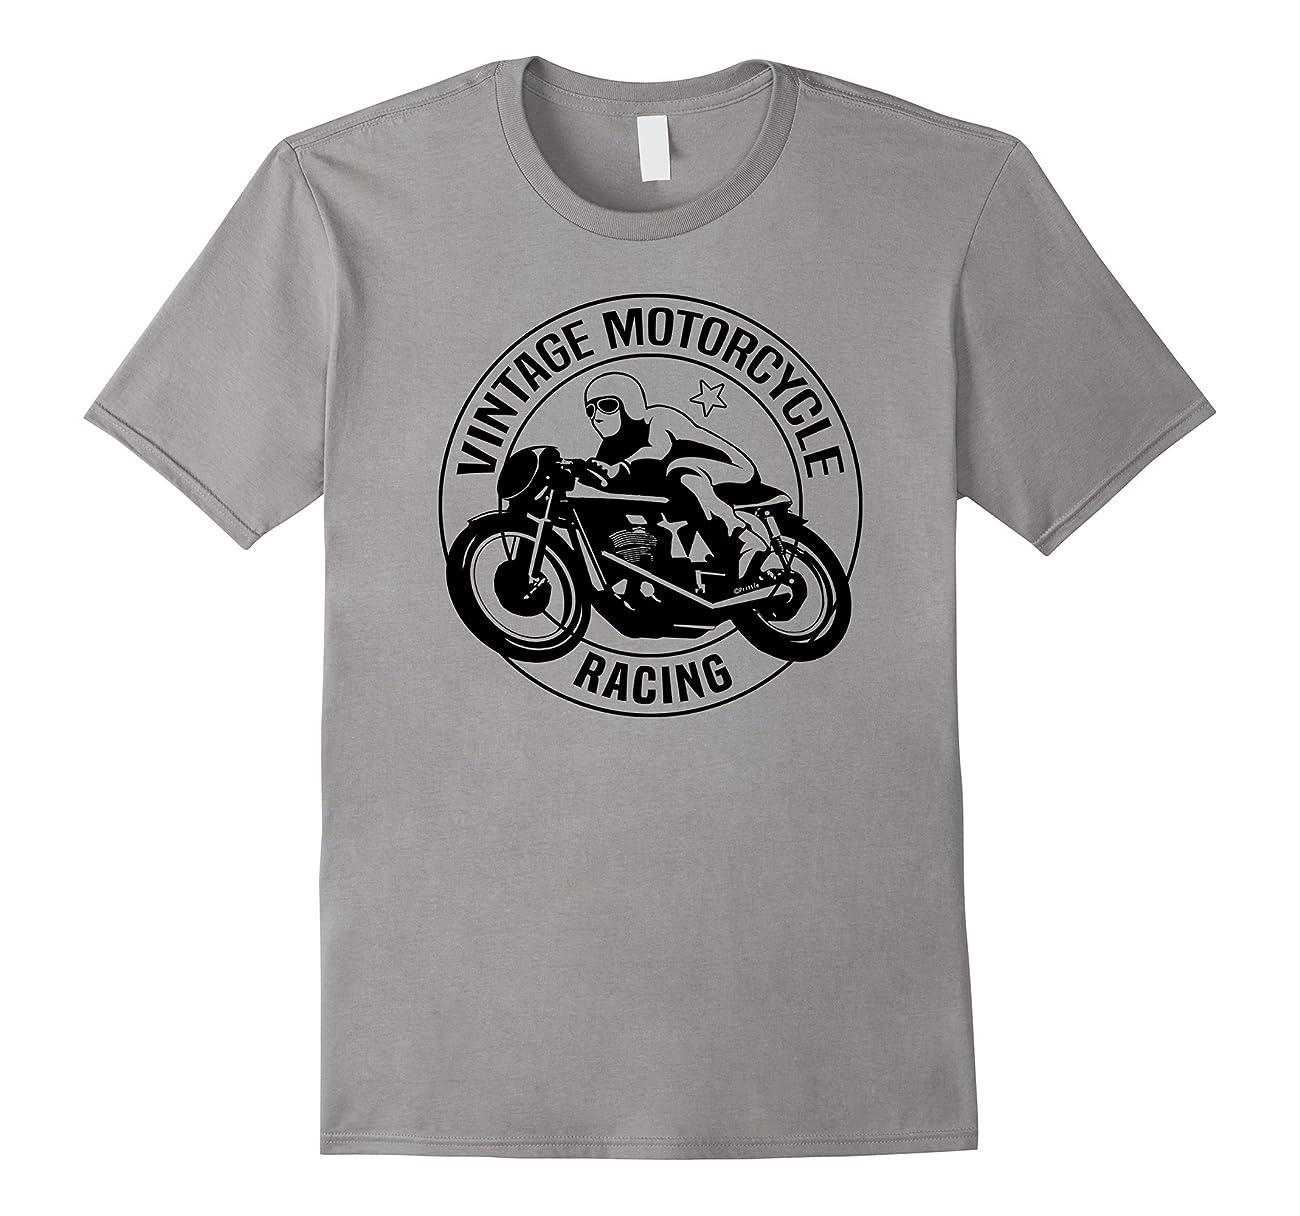 Vintage Classic Motorcycle Racing Tshirt 0